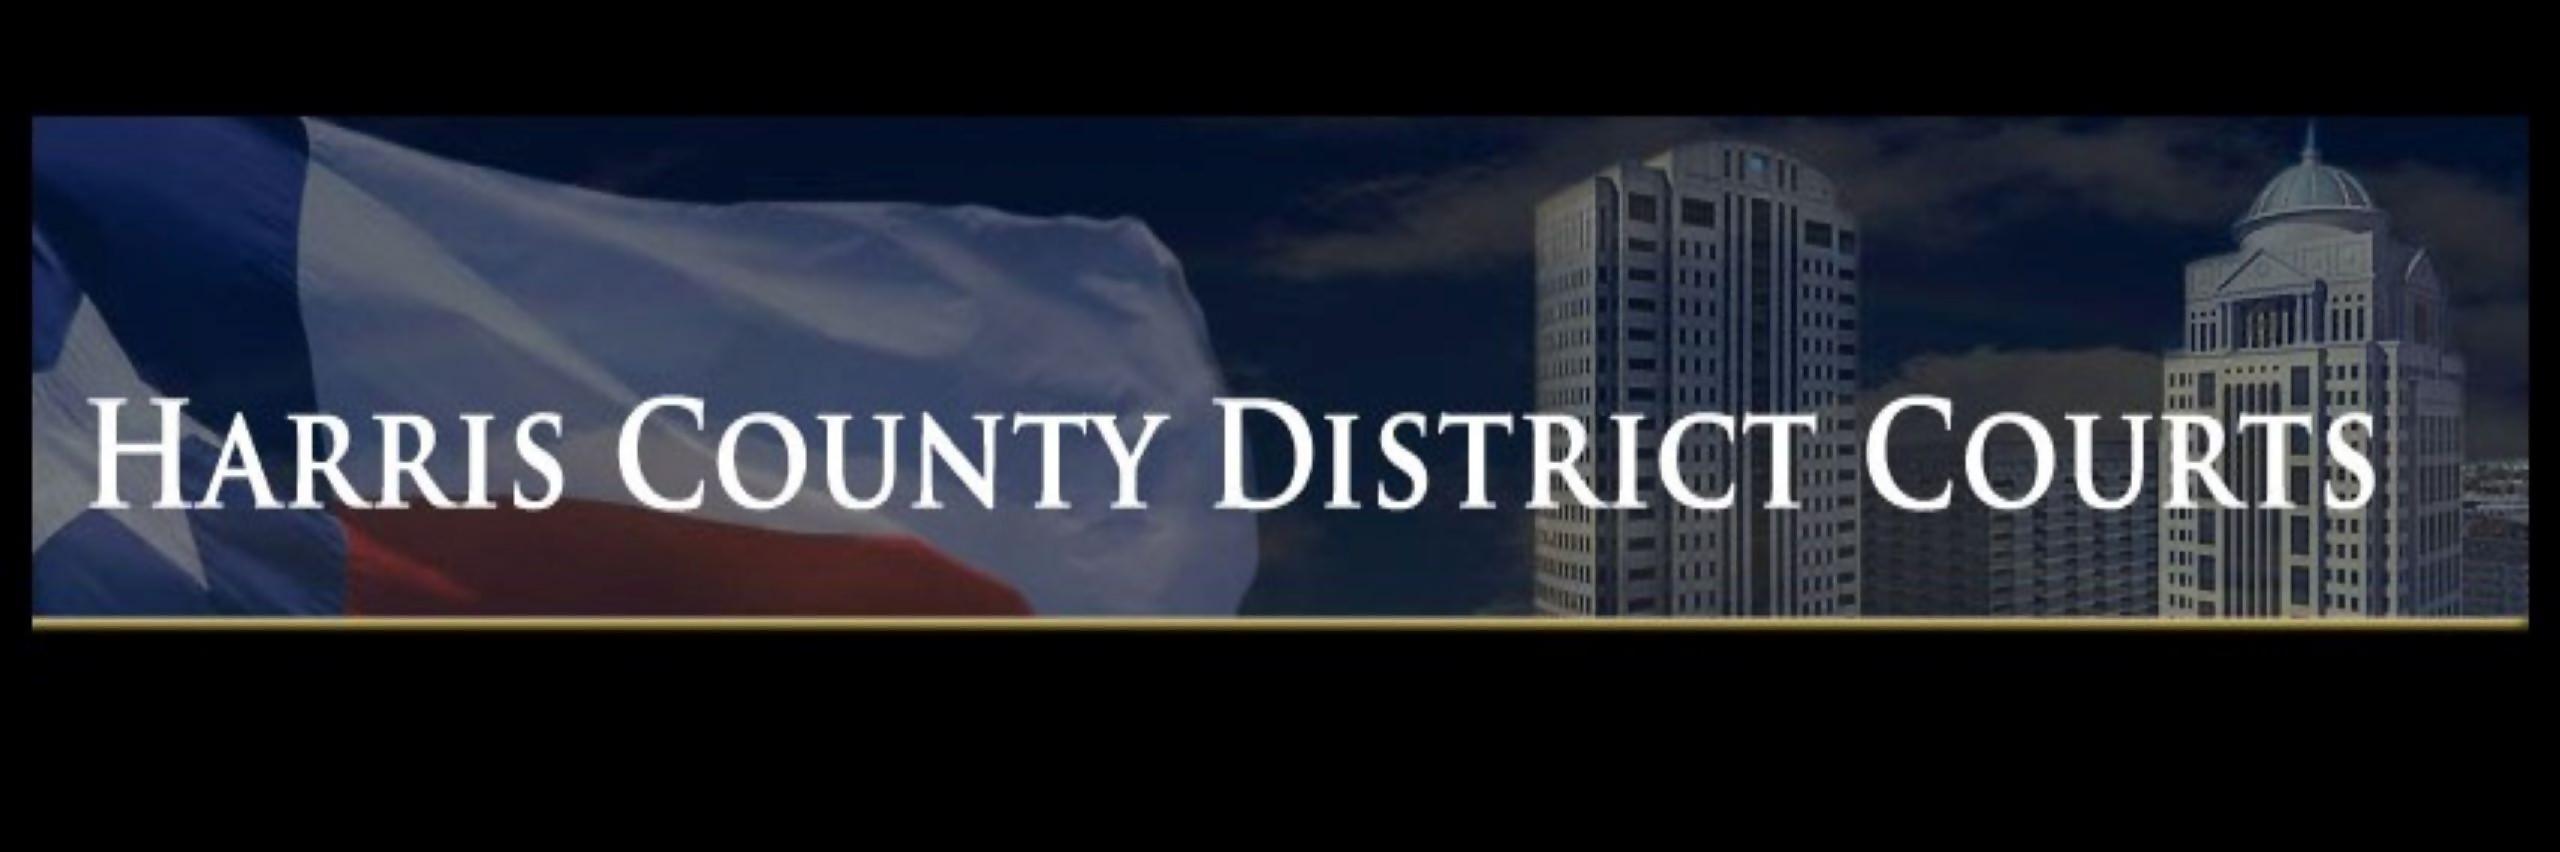 312th District Court AJ - Live Stream